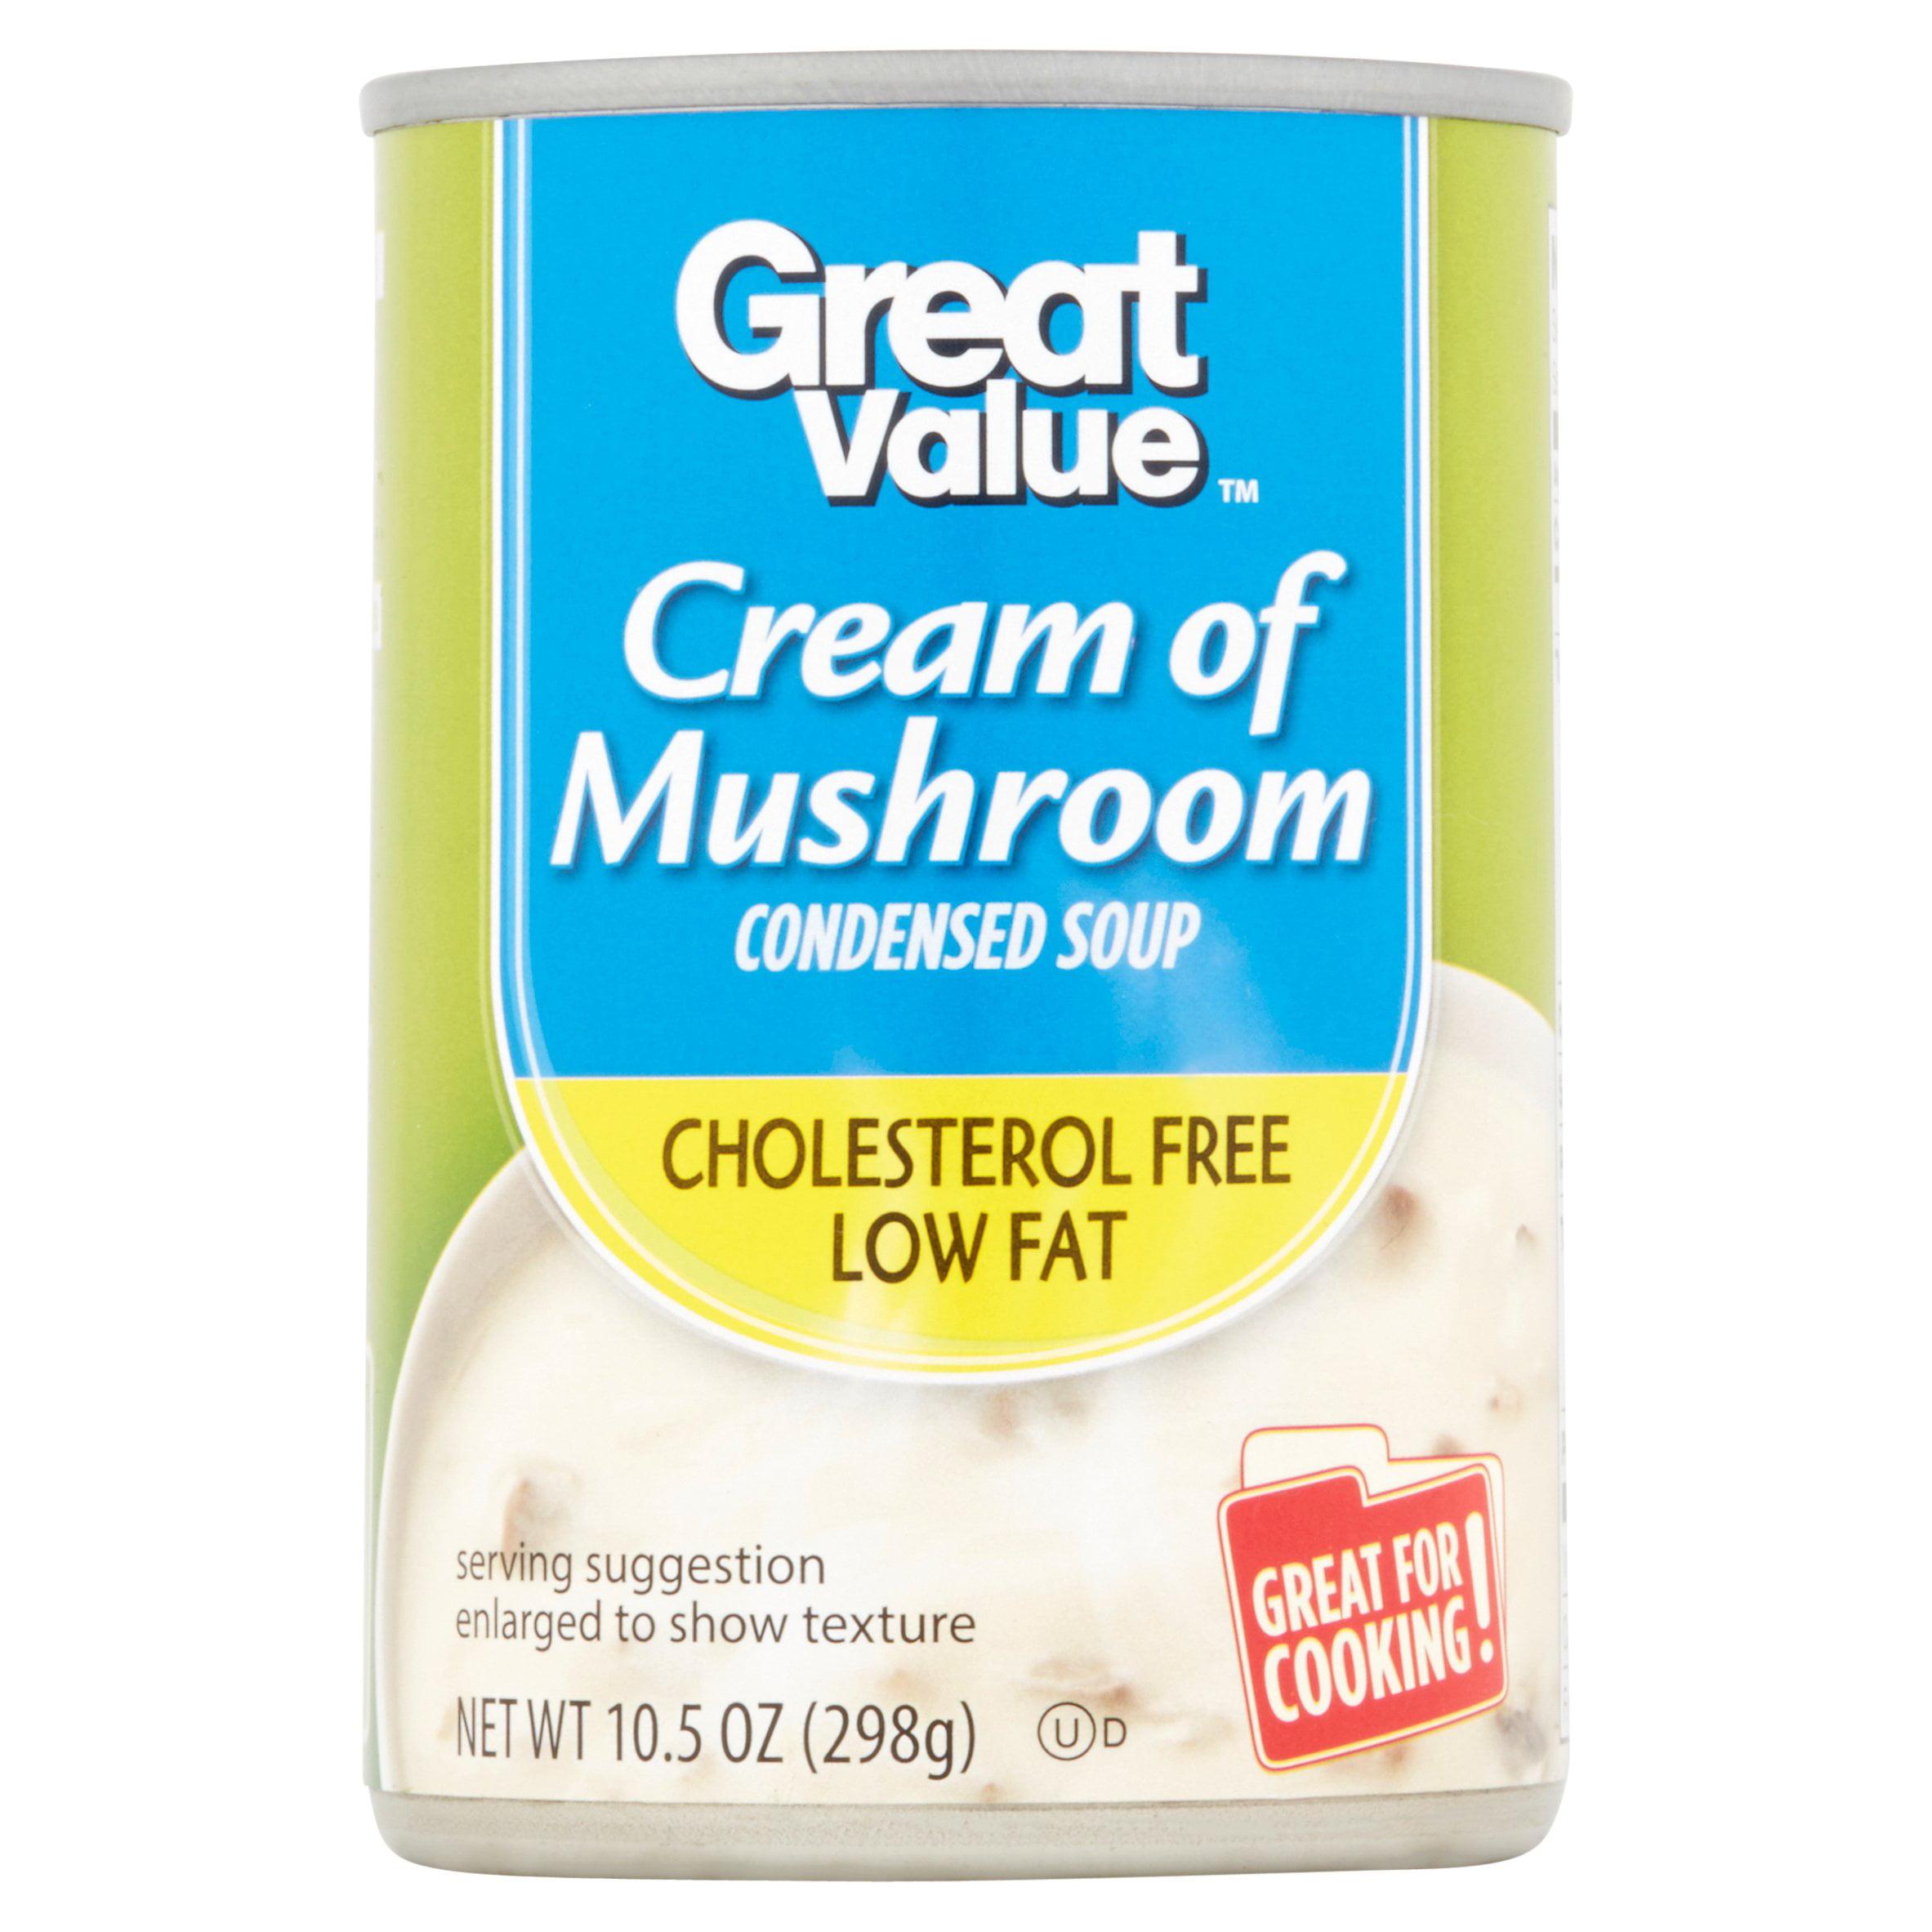 Great Value Cream of Mushroom Condensed Soup, Cholesterol Free Fat Free, 10.5 oz